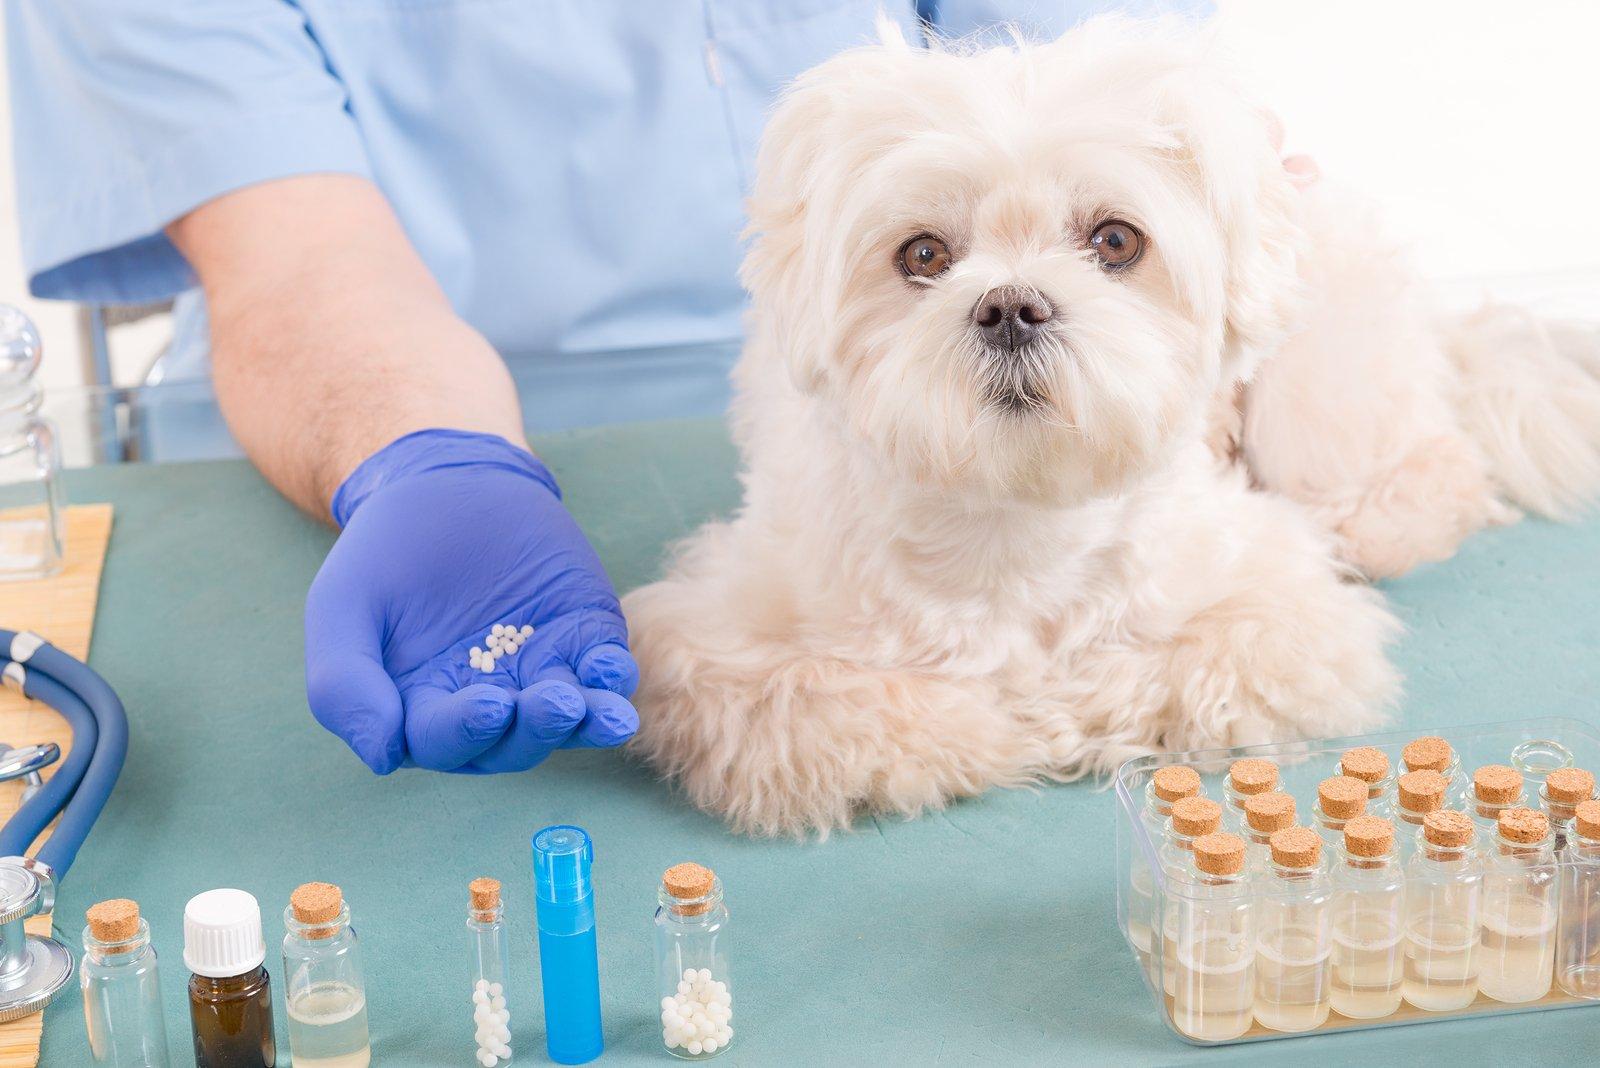 dog and medication